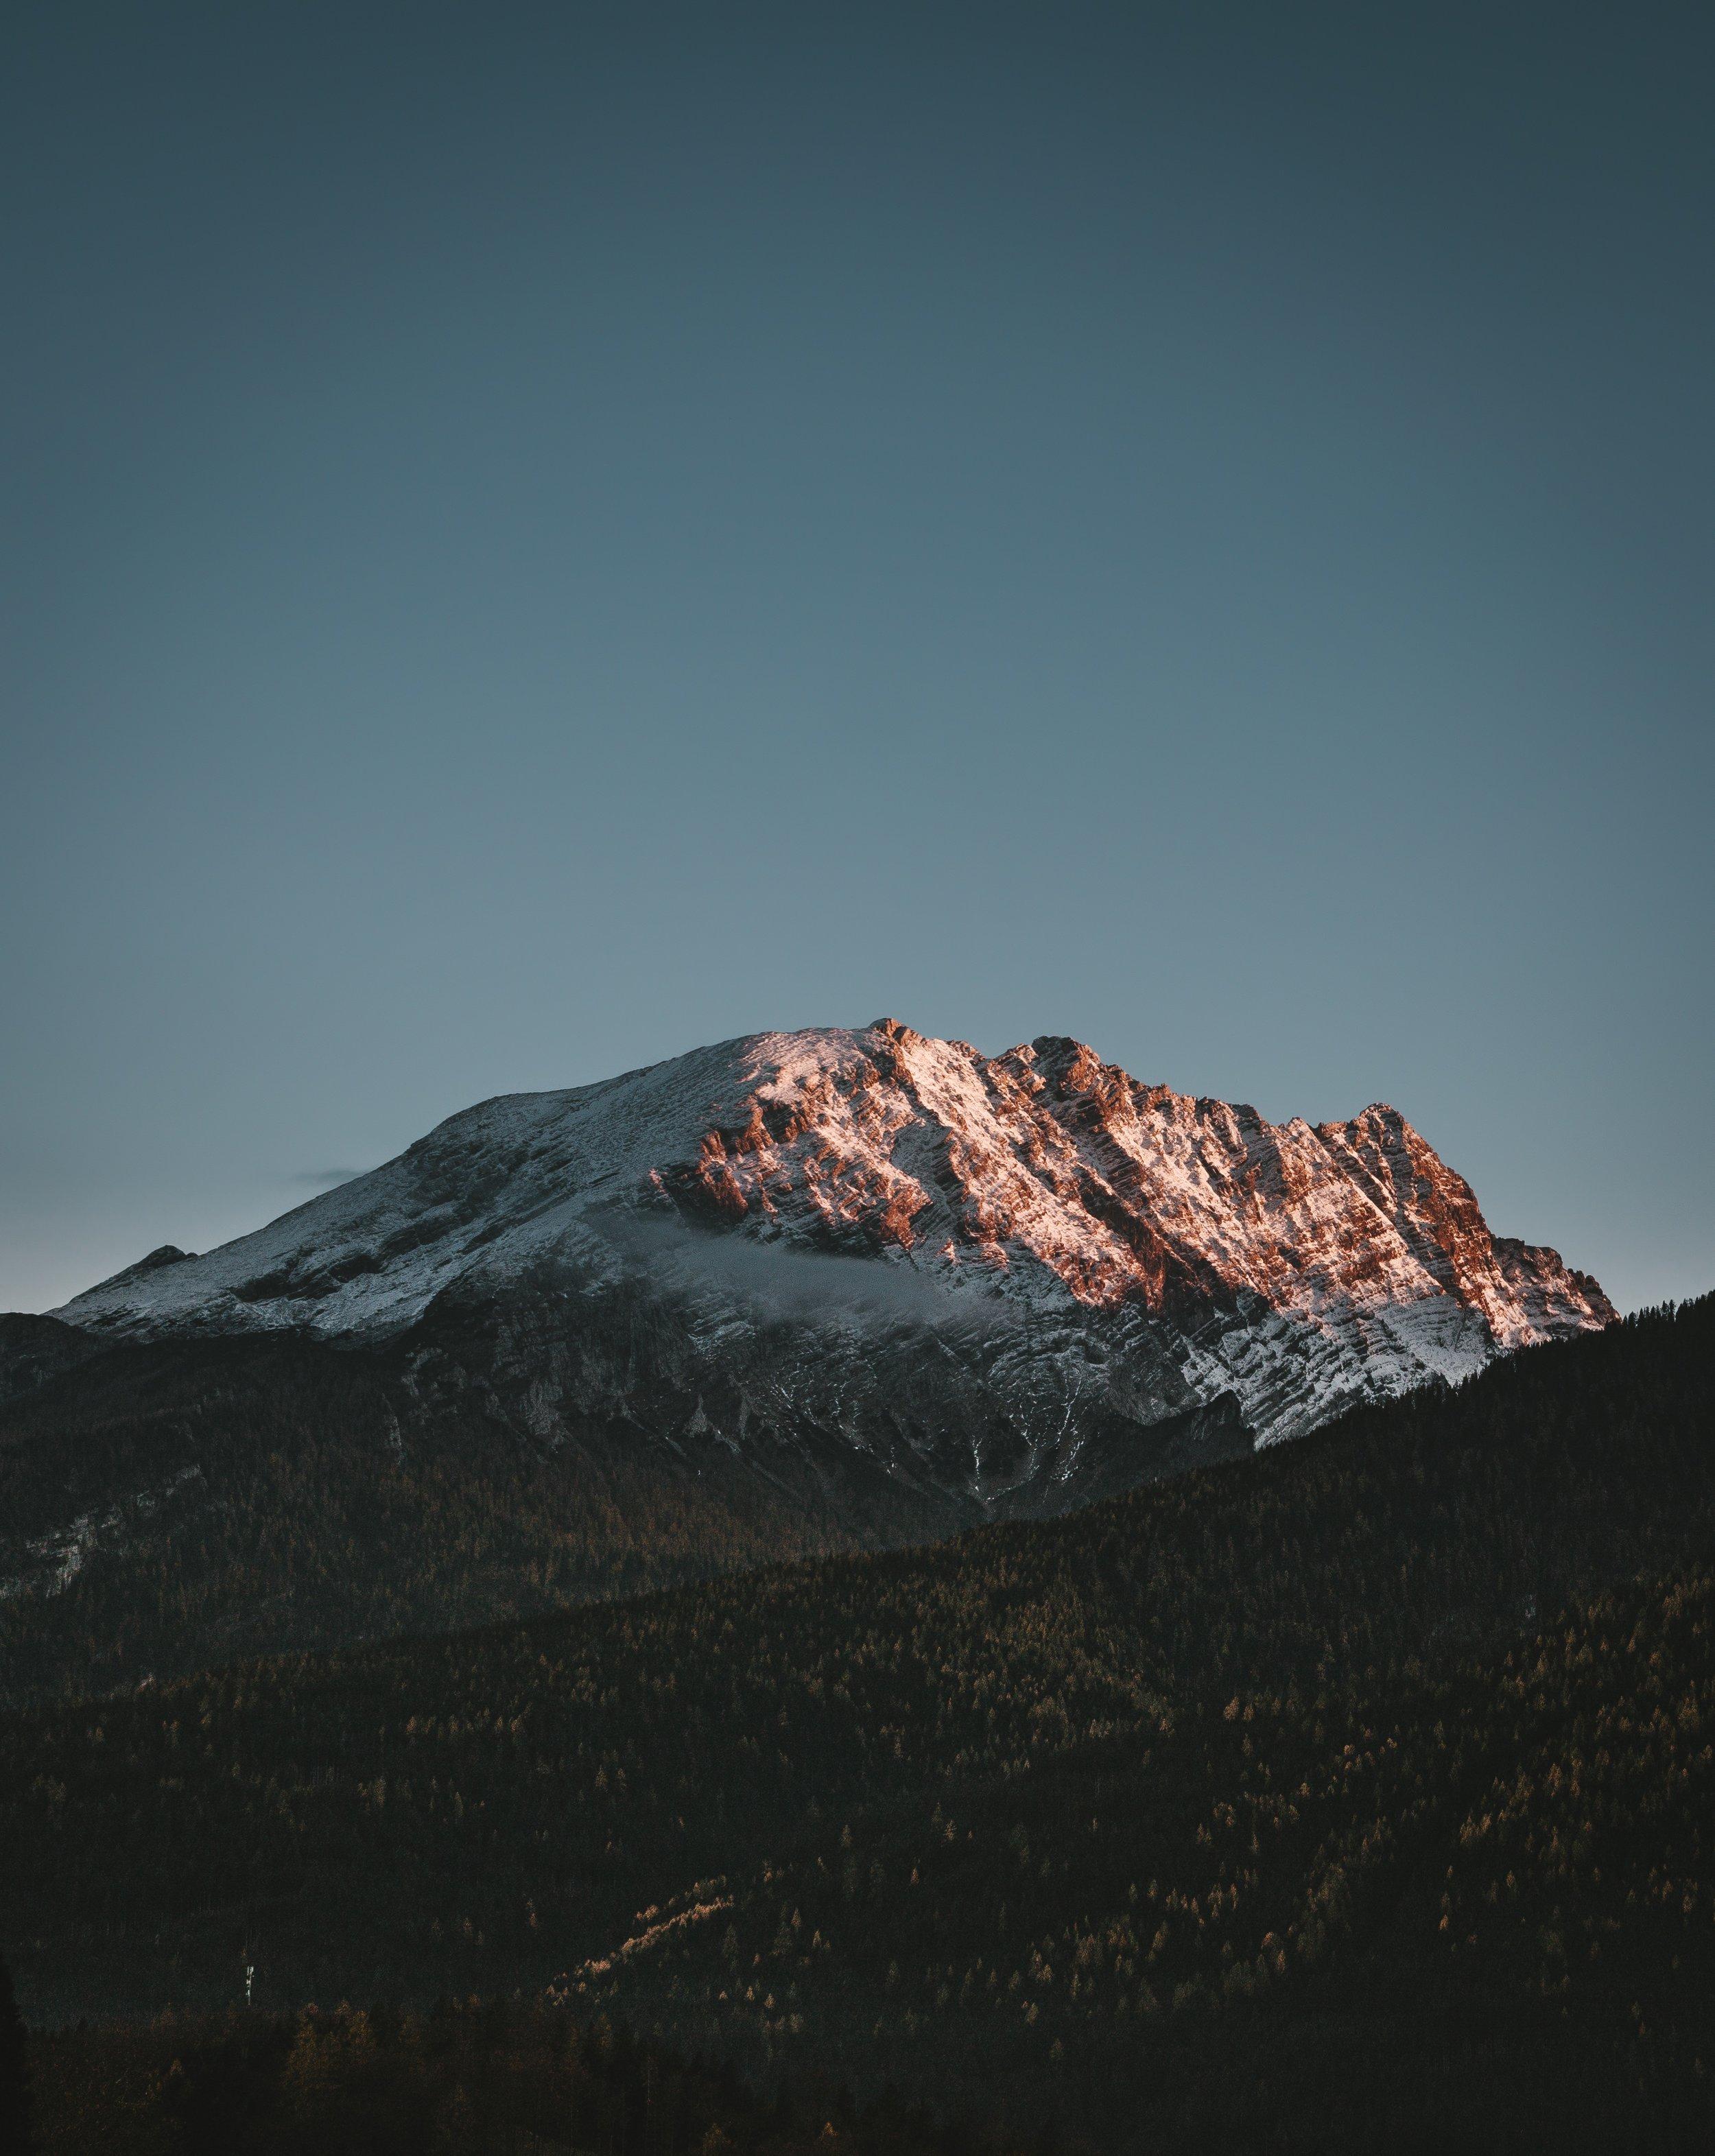 alpine-mountains-sunset-hiking-mood-light-1444425-pxhere.com.jpg